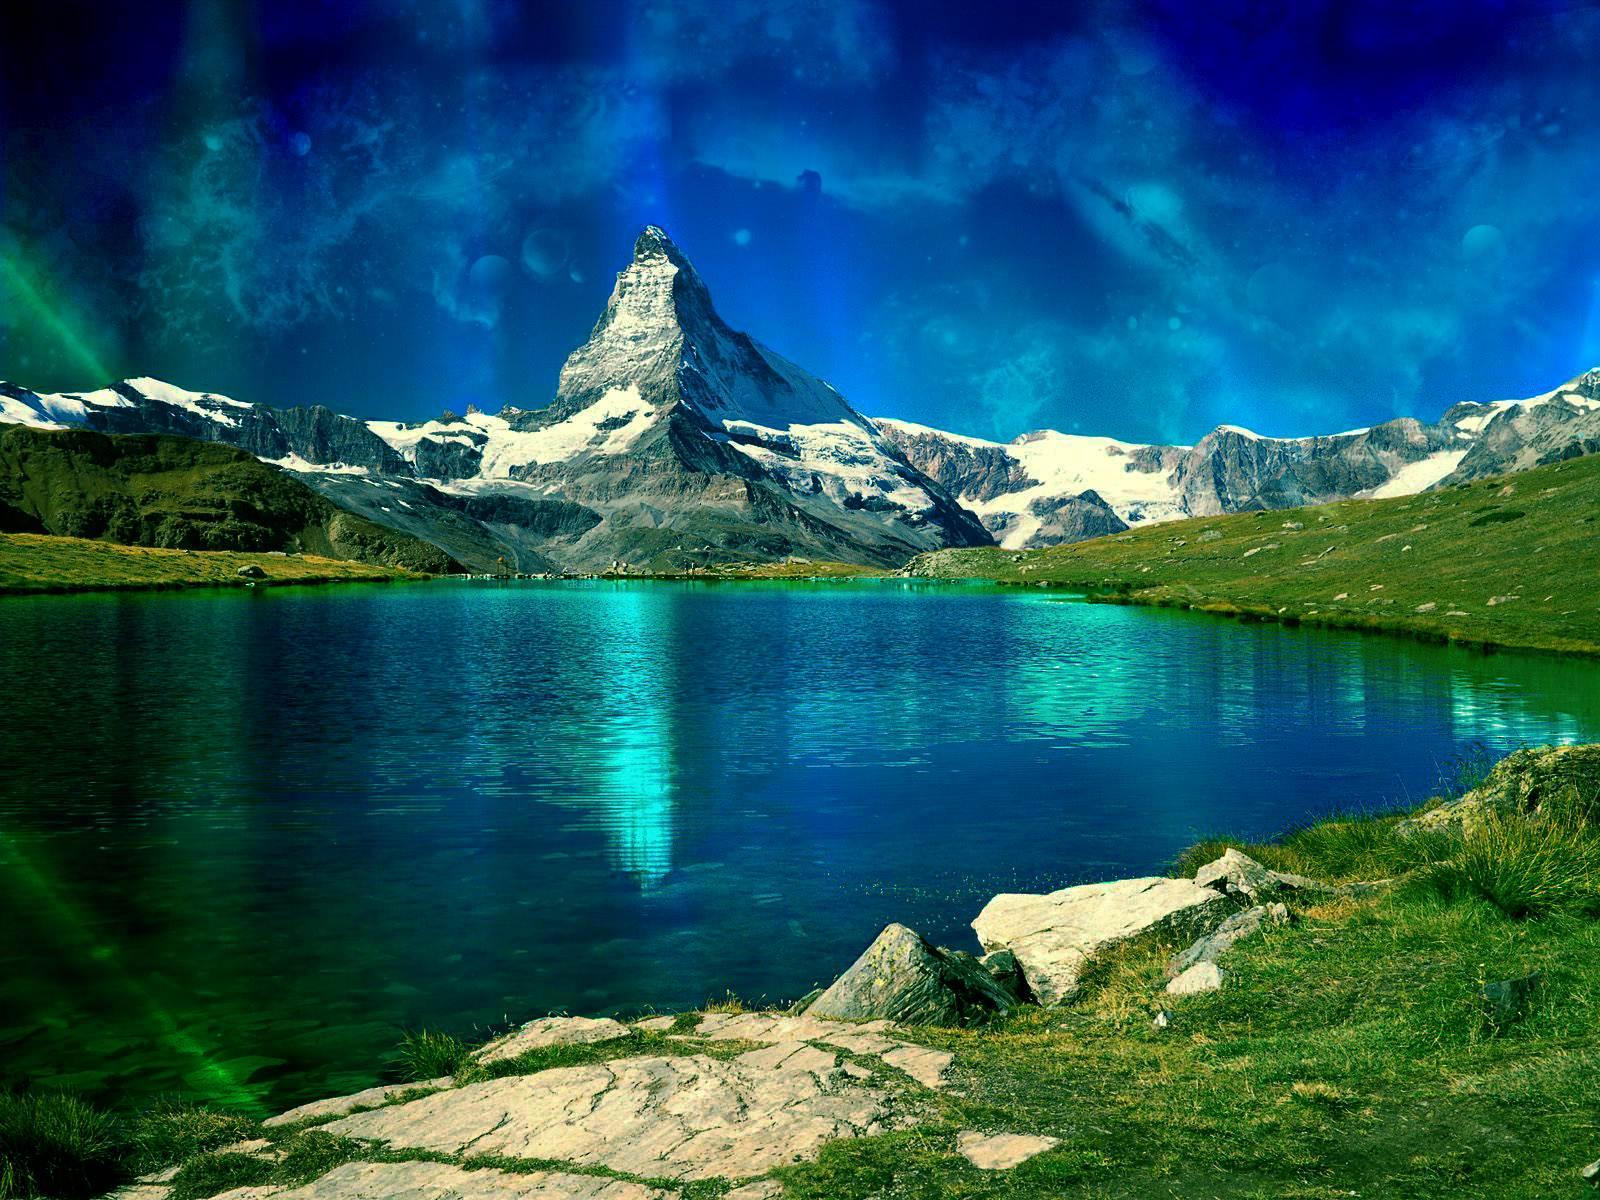 http://1.bp.blogspot.com/_9EVC1Jt2fJM/TR37xIcz56I/AAAAAAAAALA/g703qXxGw5k/s1600/wallpaper-paisaje-monta%C3%B1as.jpg